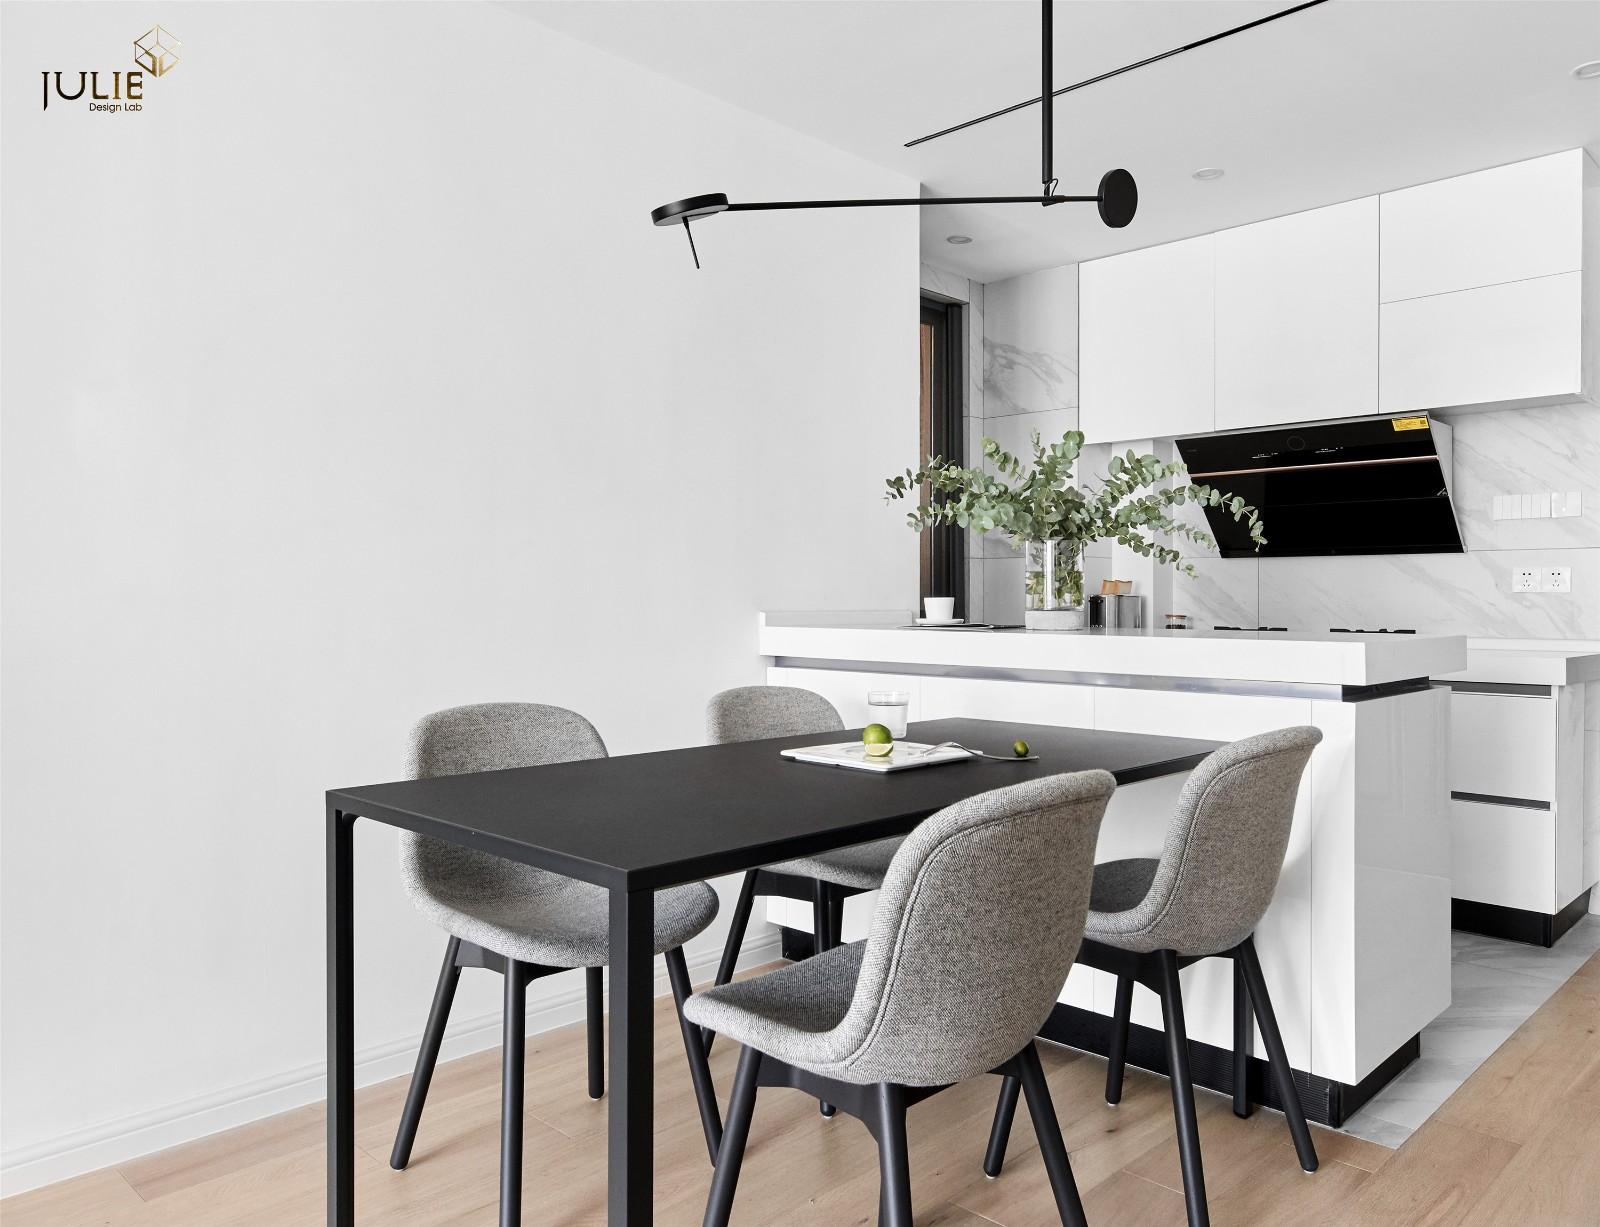 Ramble|软装总得带点绿厨房1图现代简约餐厅设计图片赏析